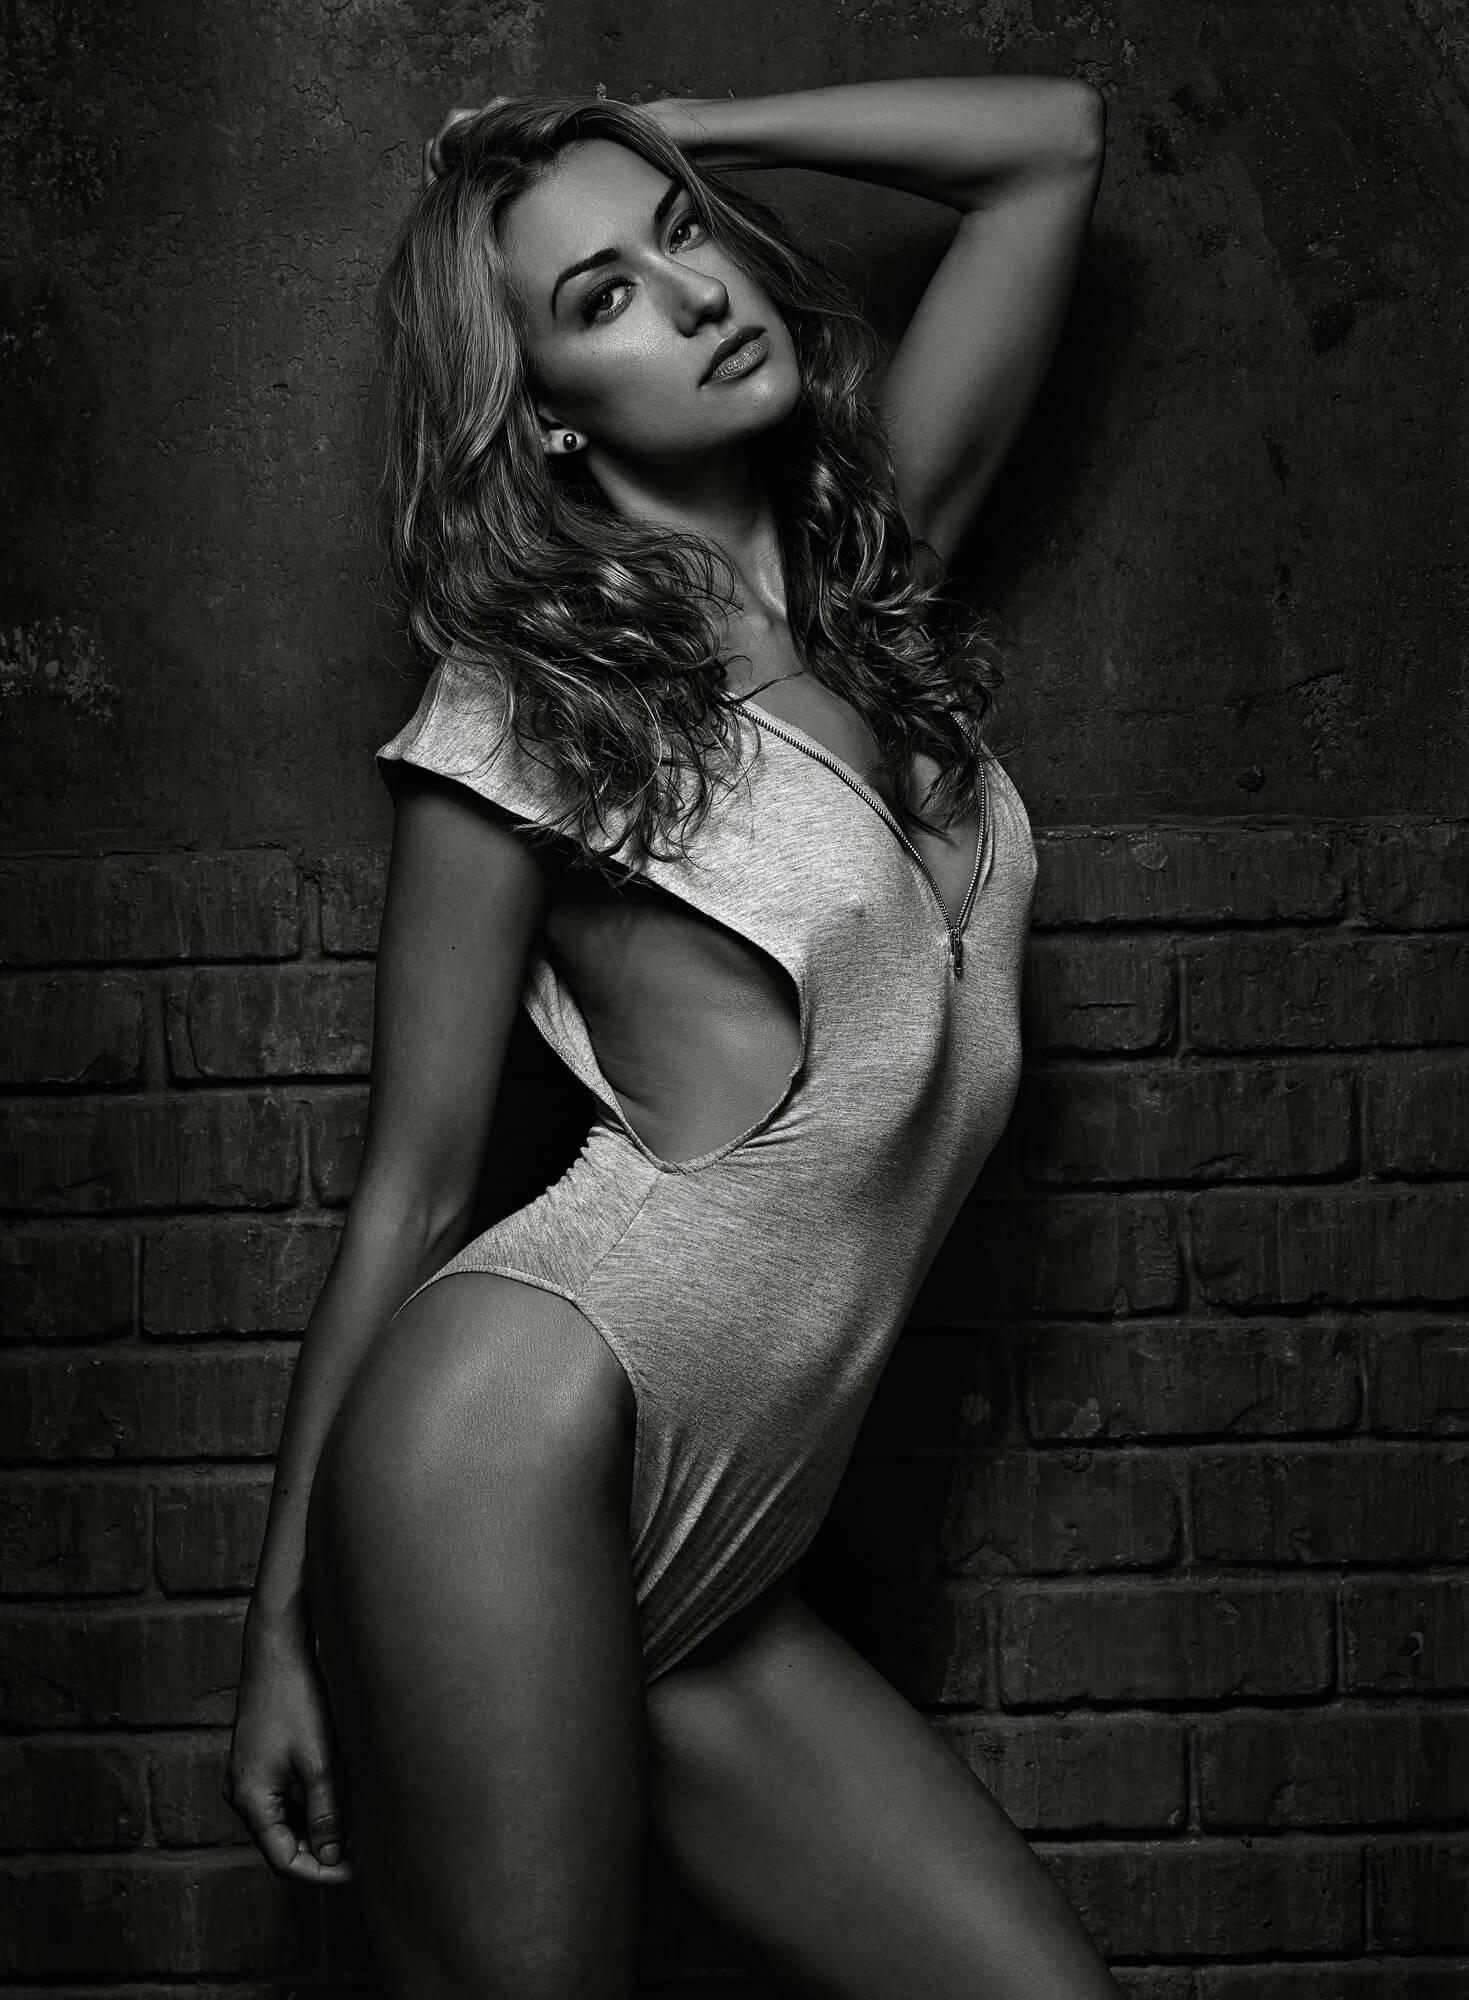 Tasya Teles sexy lingerie pics